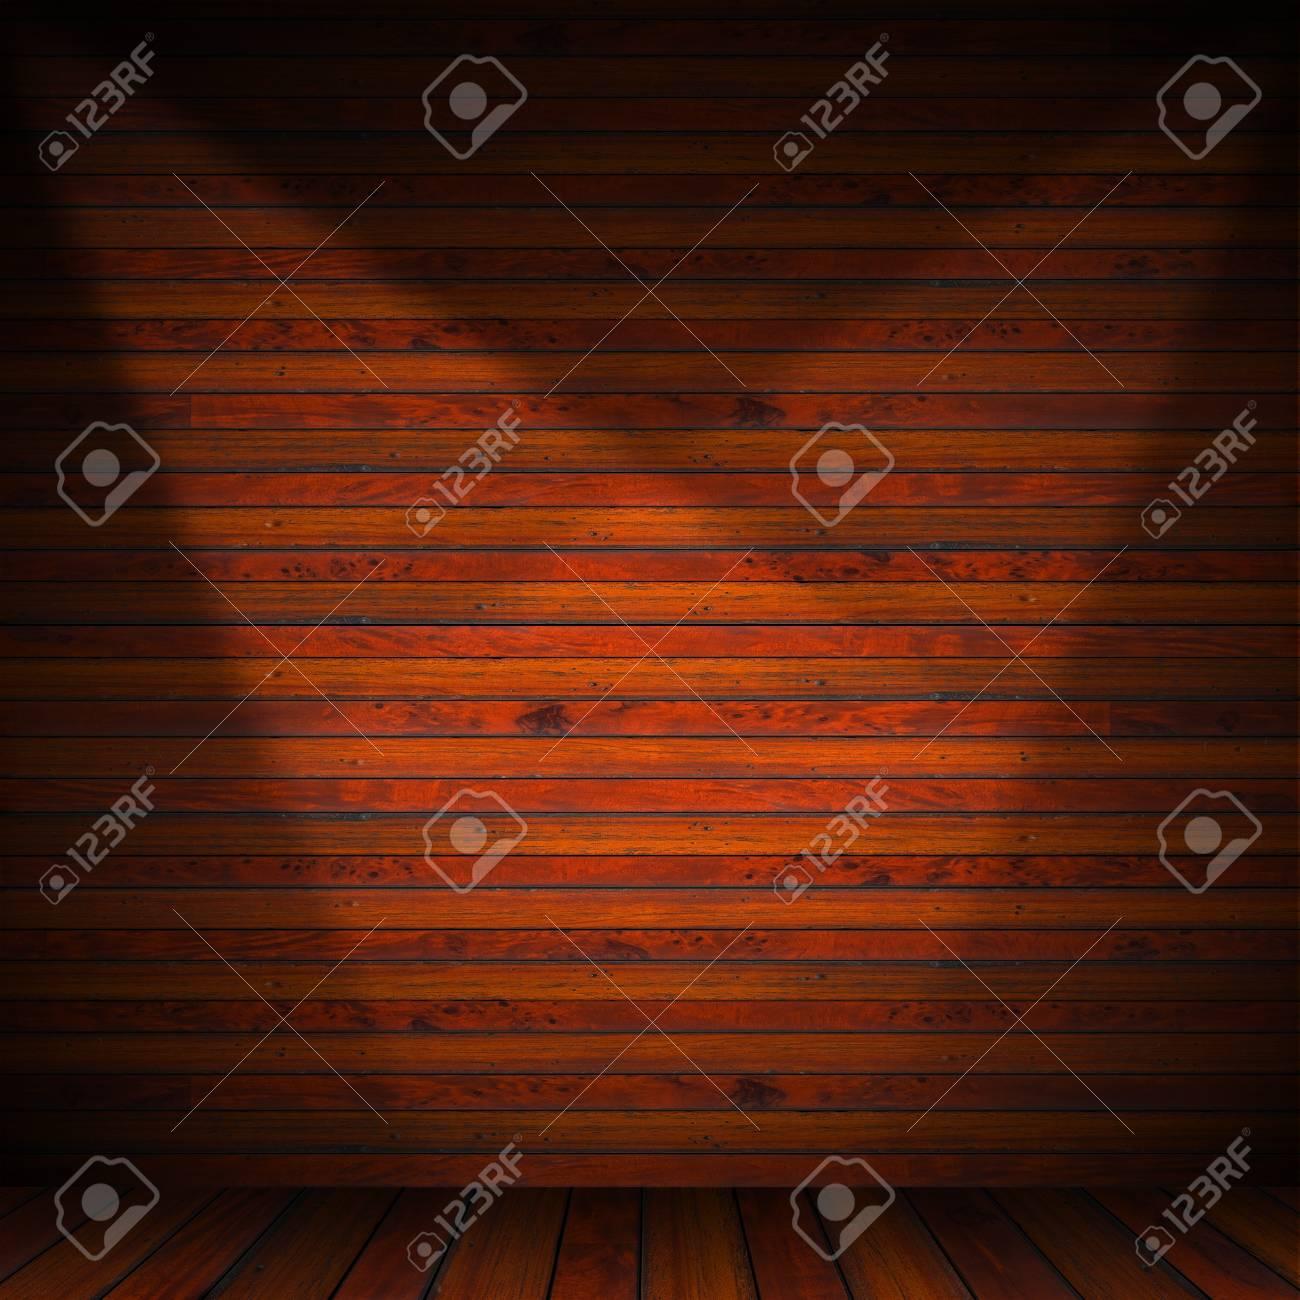 Wooden brown planks interior with illuminated Stock Photo - 17291400